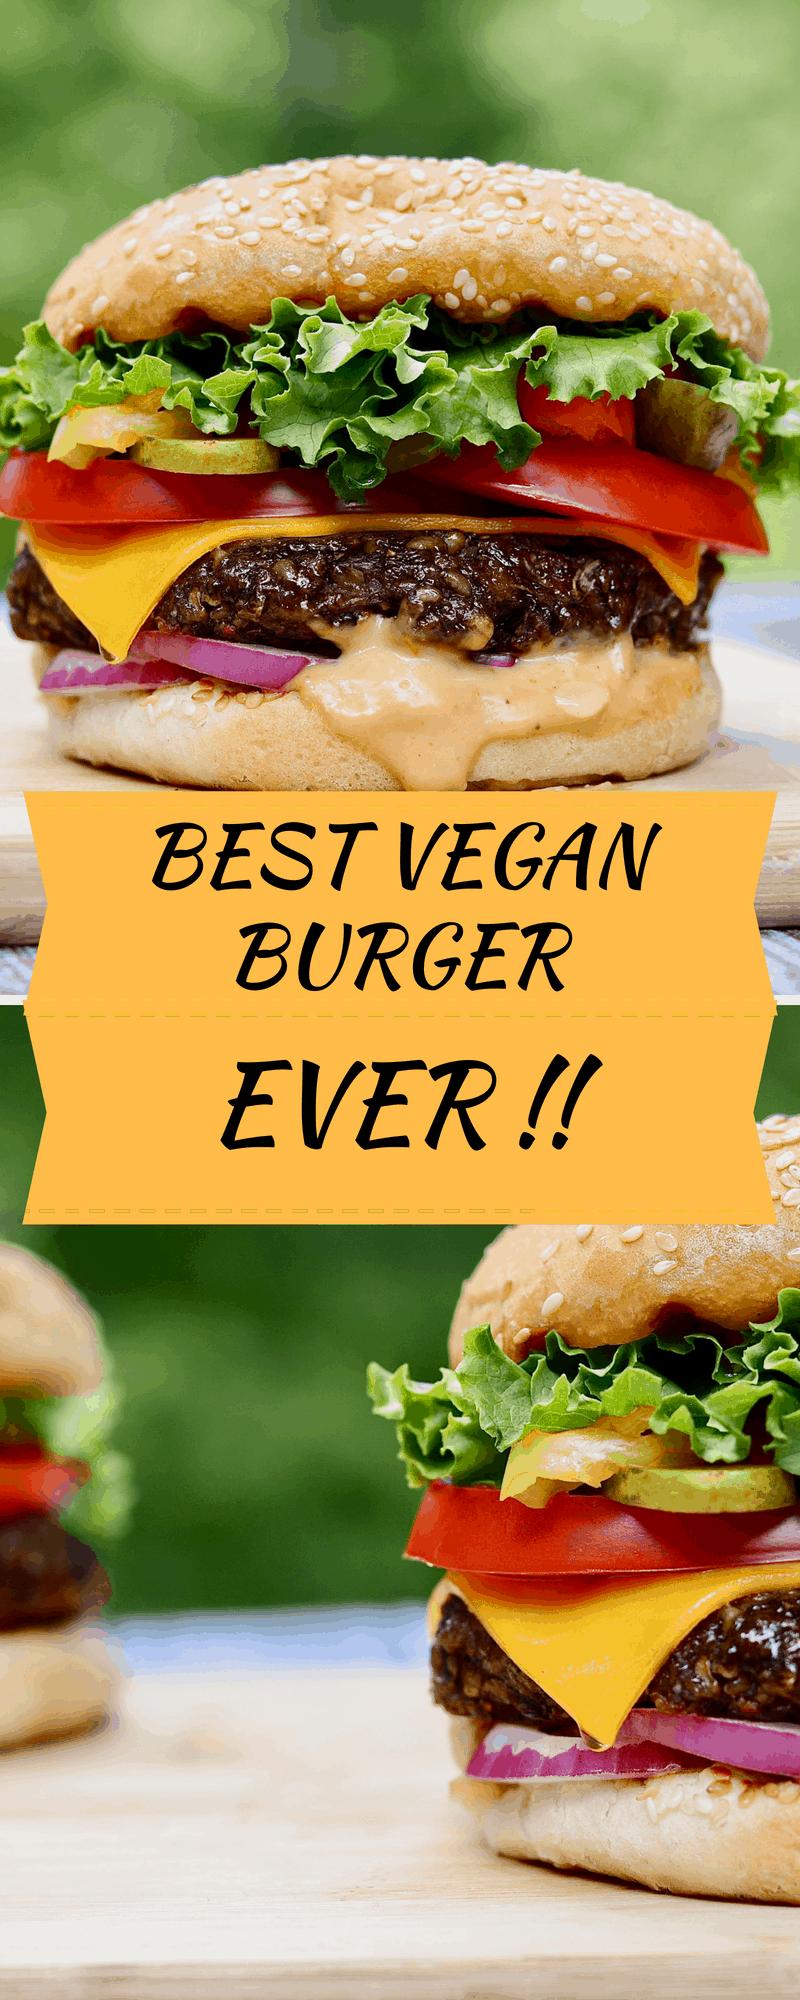 best vegan burger on a wooden cutting board